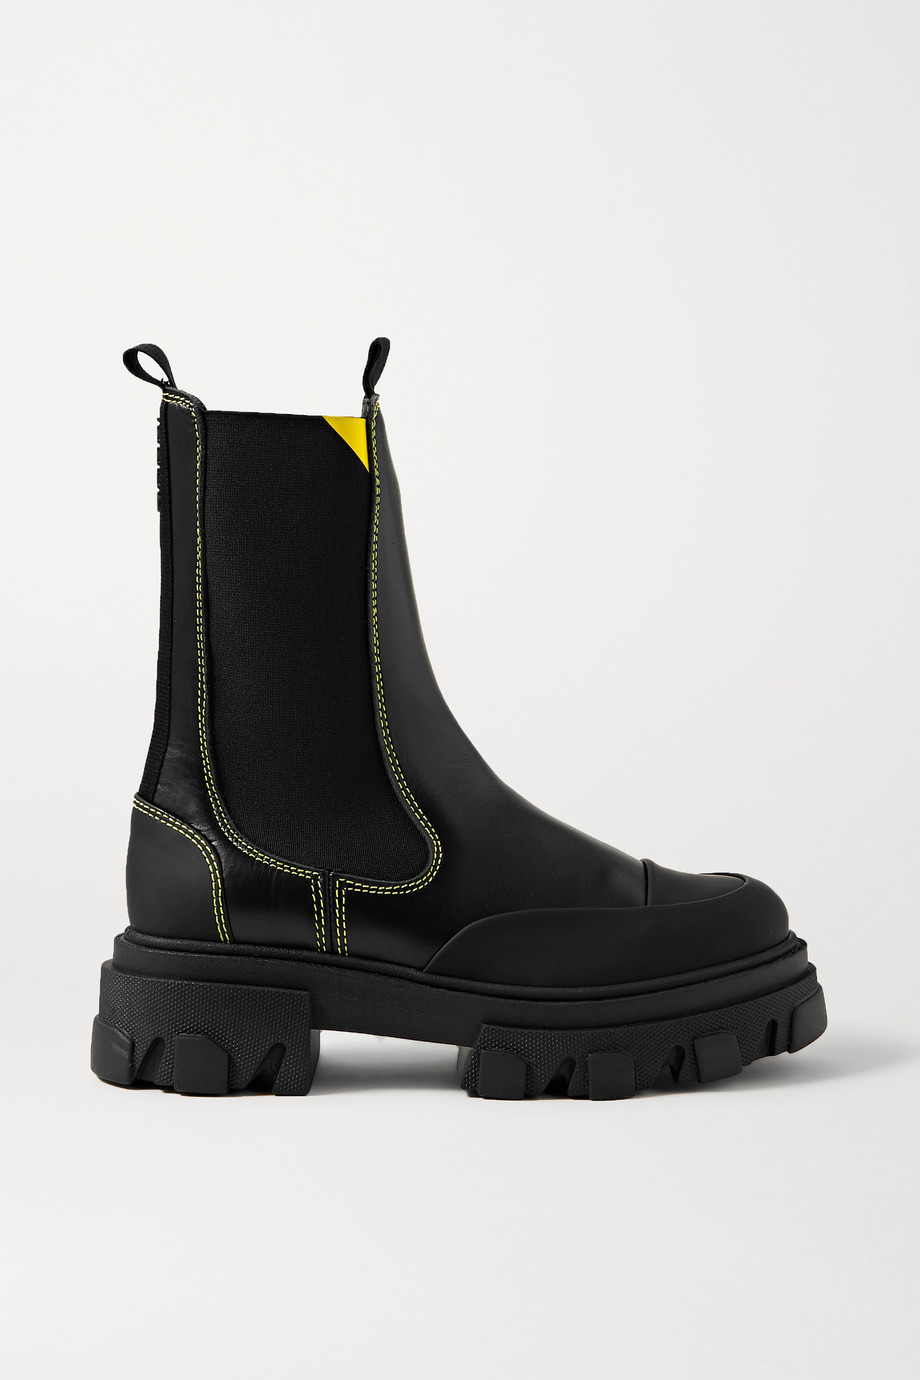 GANNI 橡胶边饰皮革切尔西靴